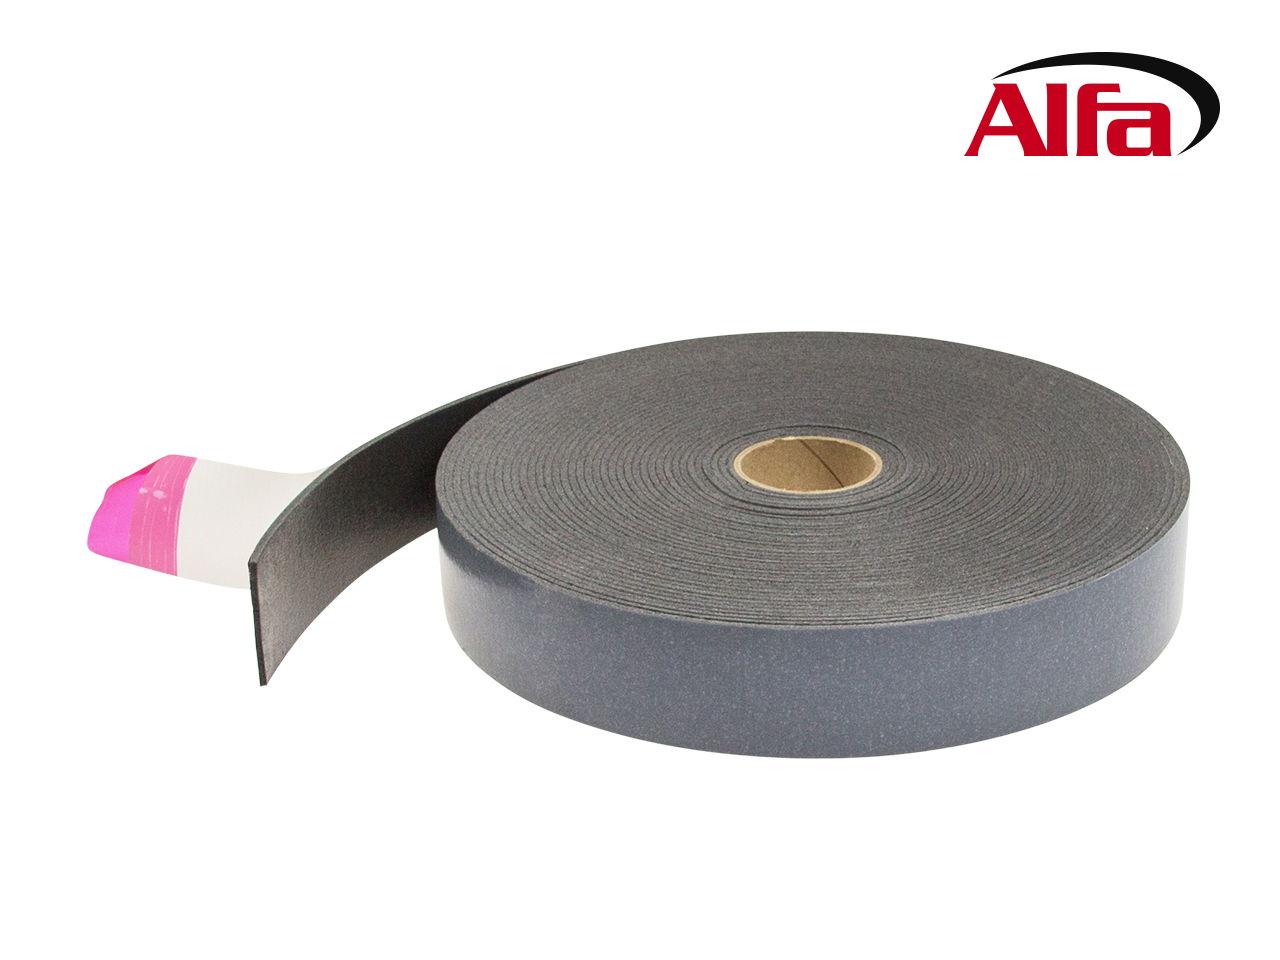 128 Alfa doppelseitiges PE-Nageldichtband